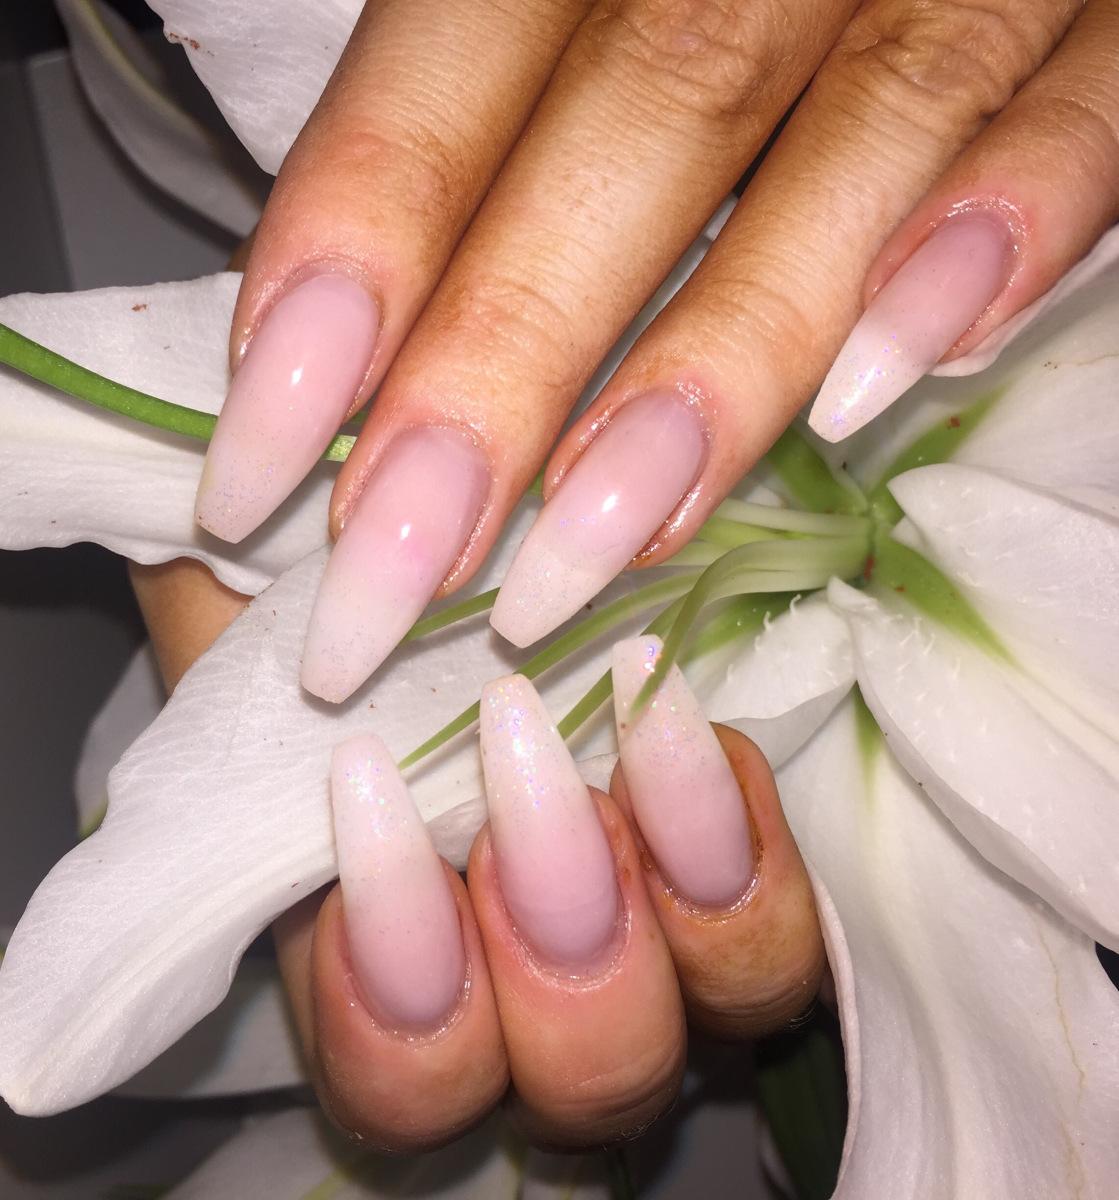 acrylic nails meadowhall photo - 1